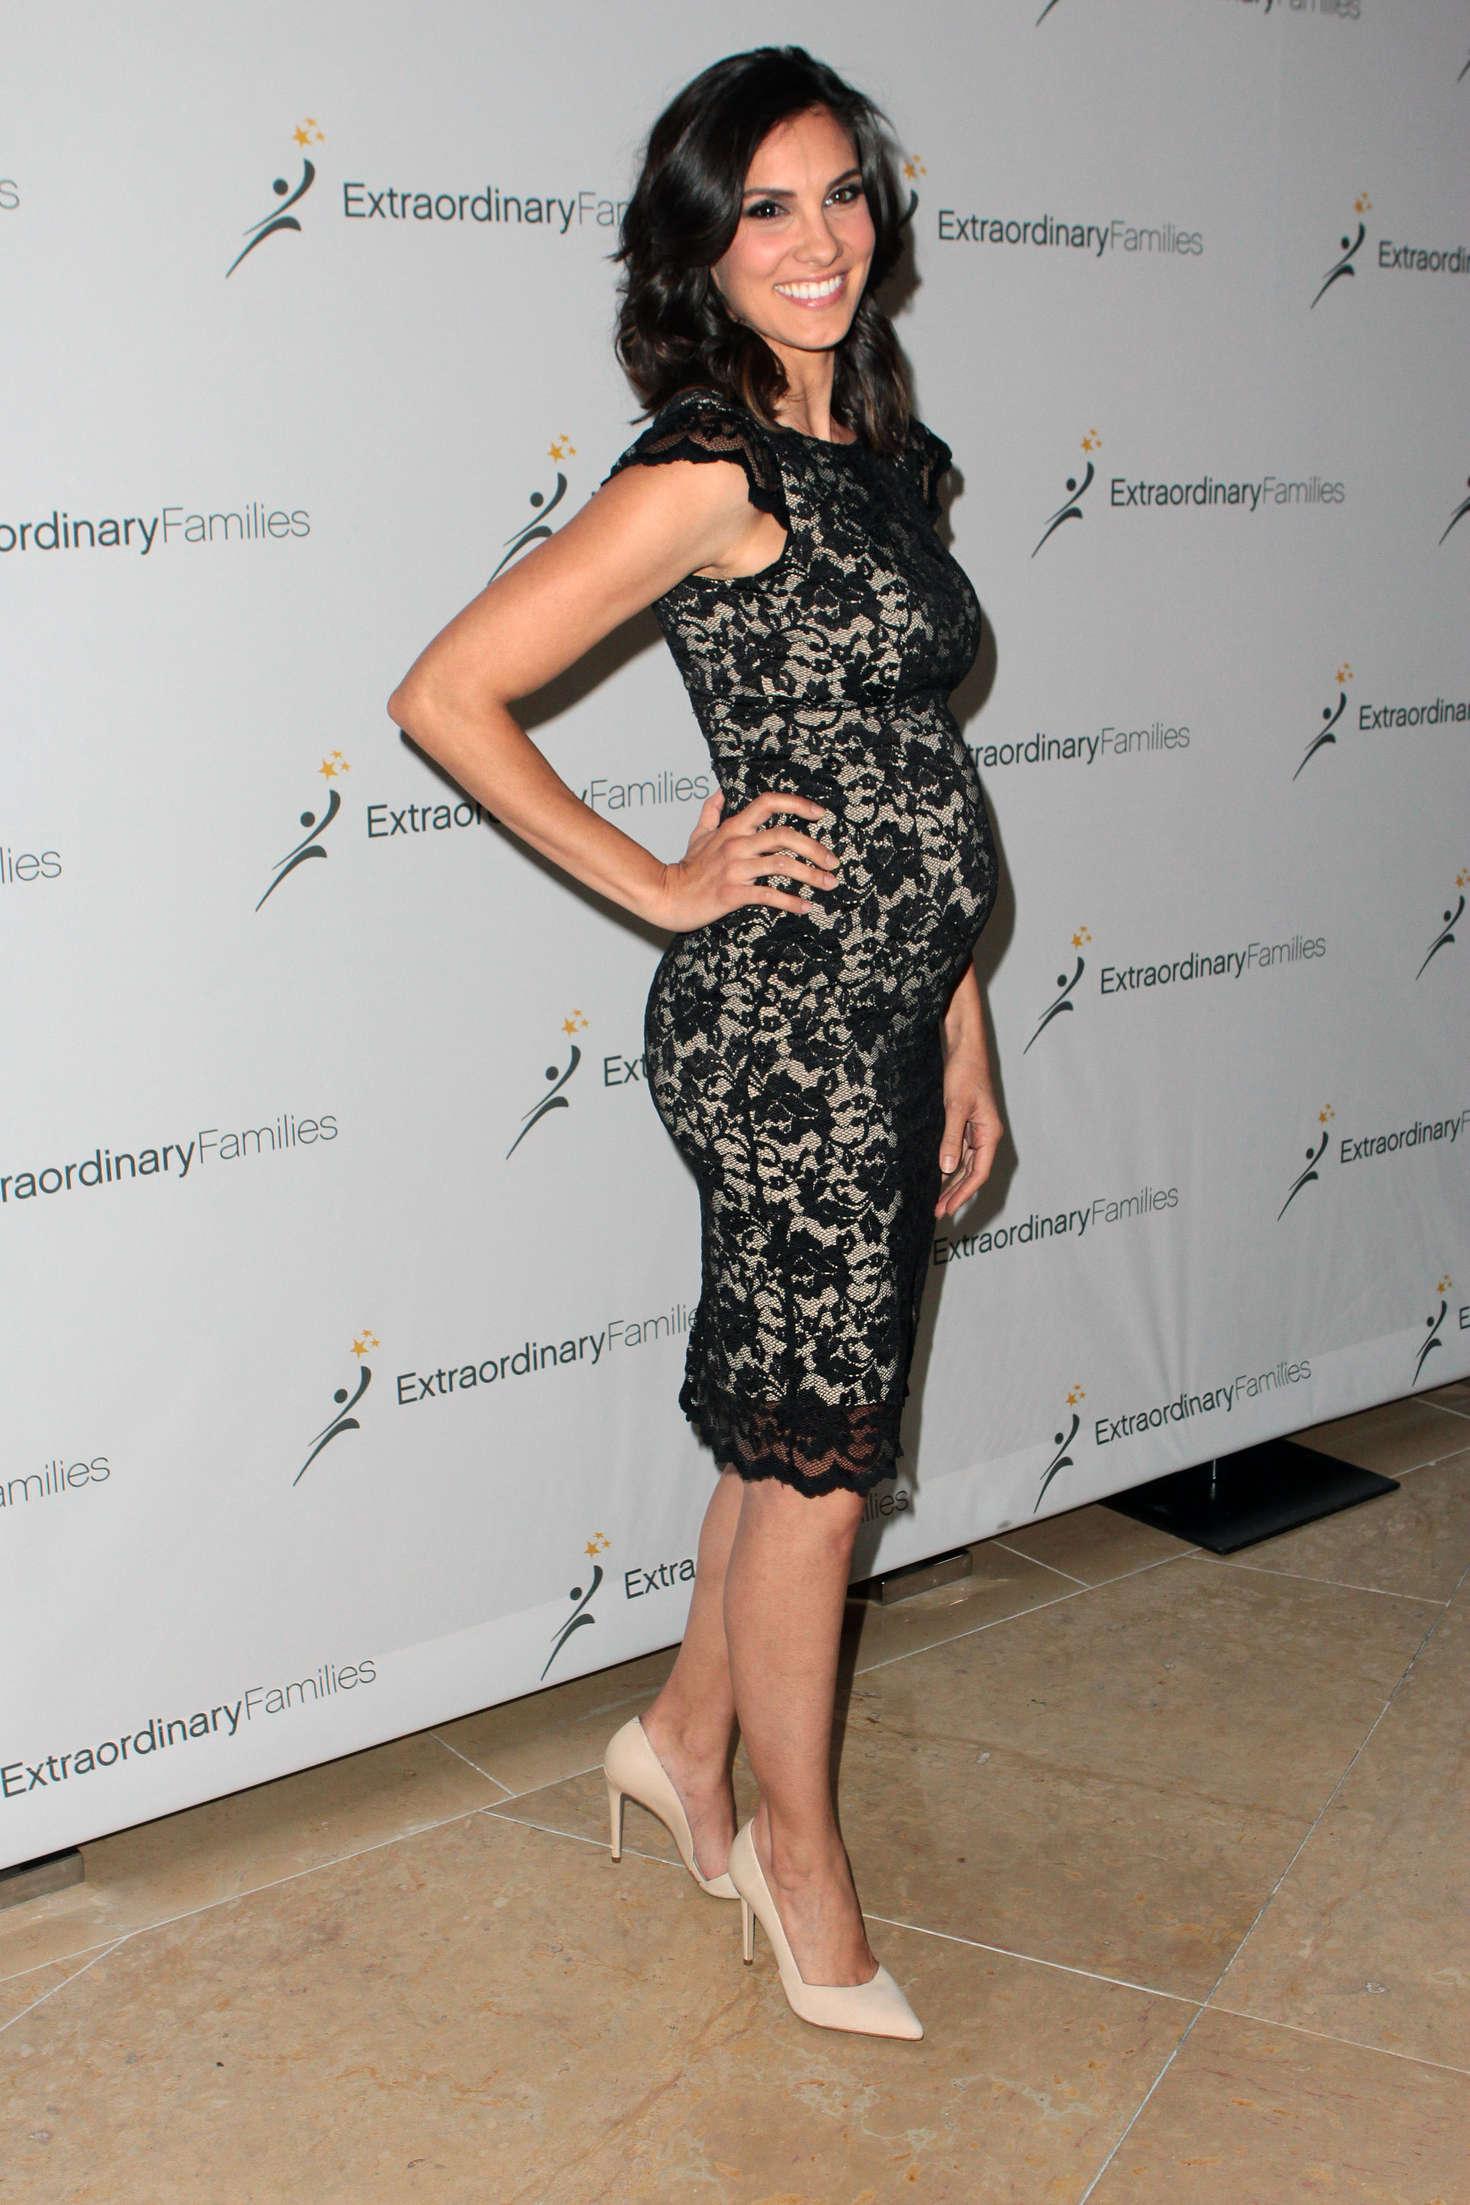 Daniela Ruah Extraordinary Families Inaugural Gala in Beverly Hills